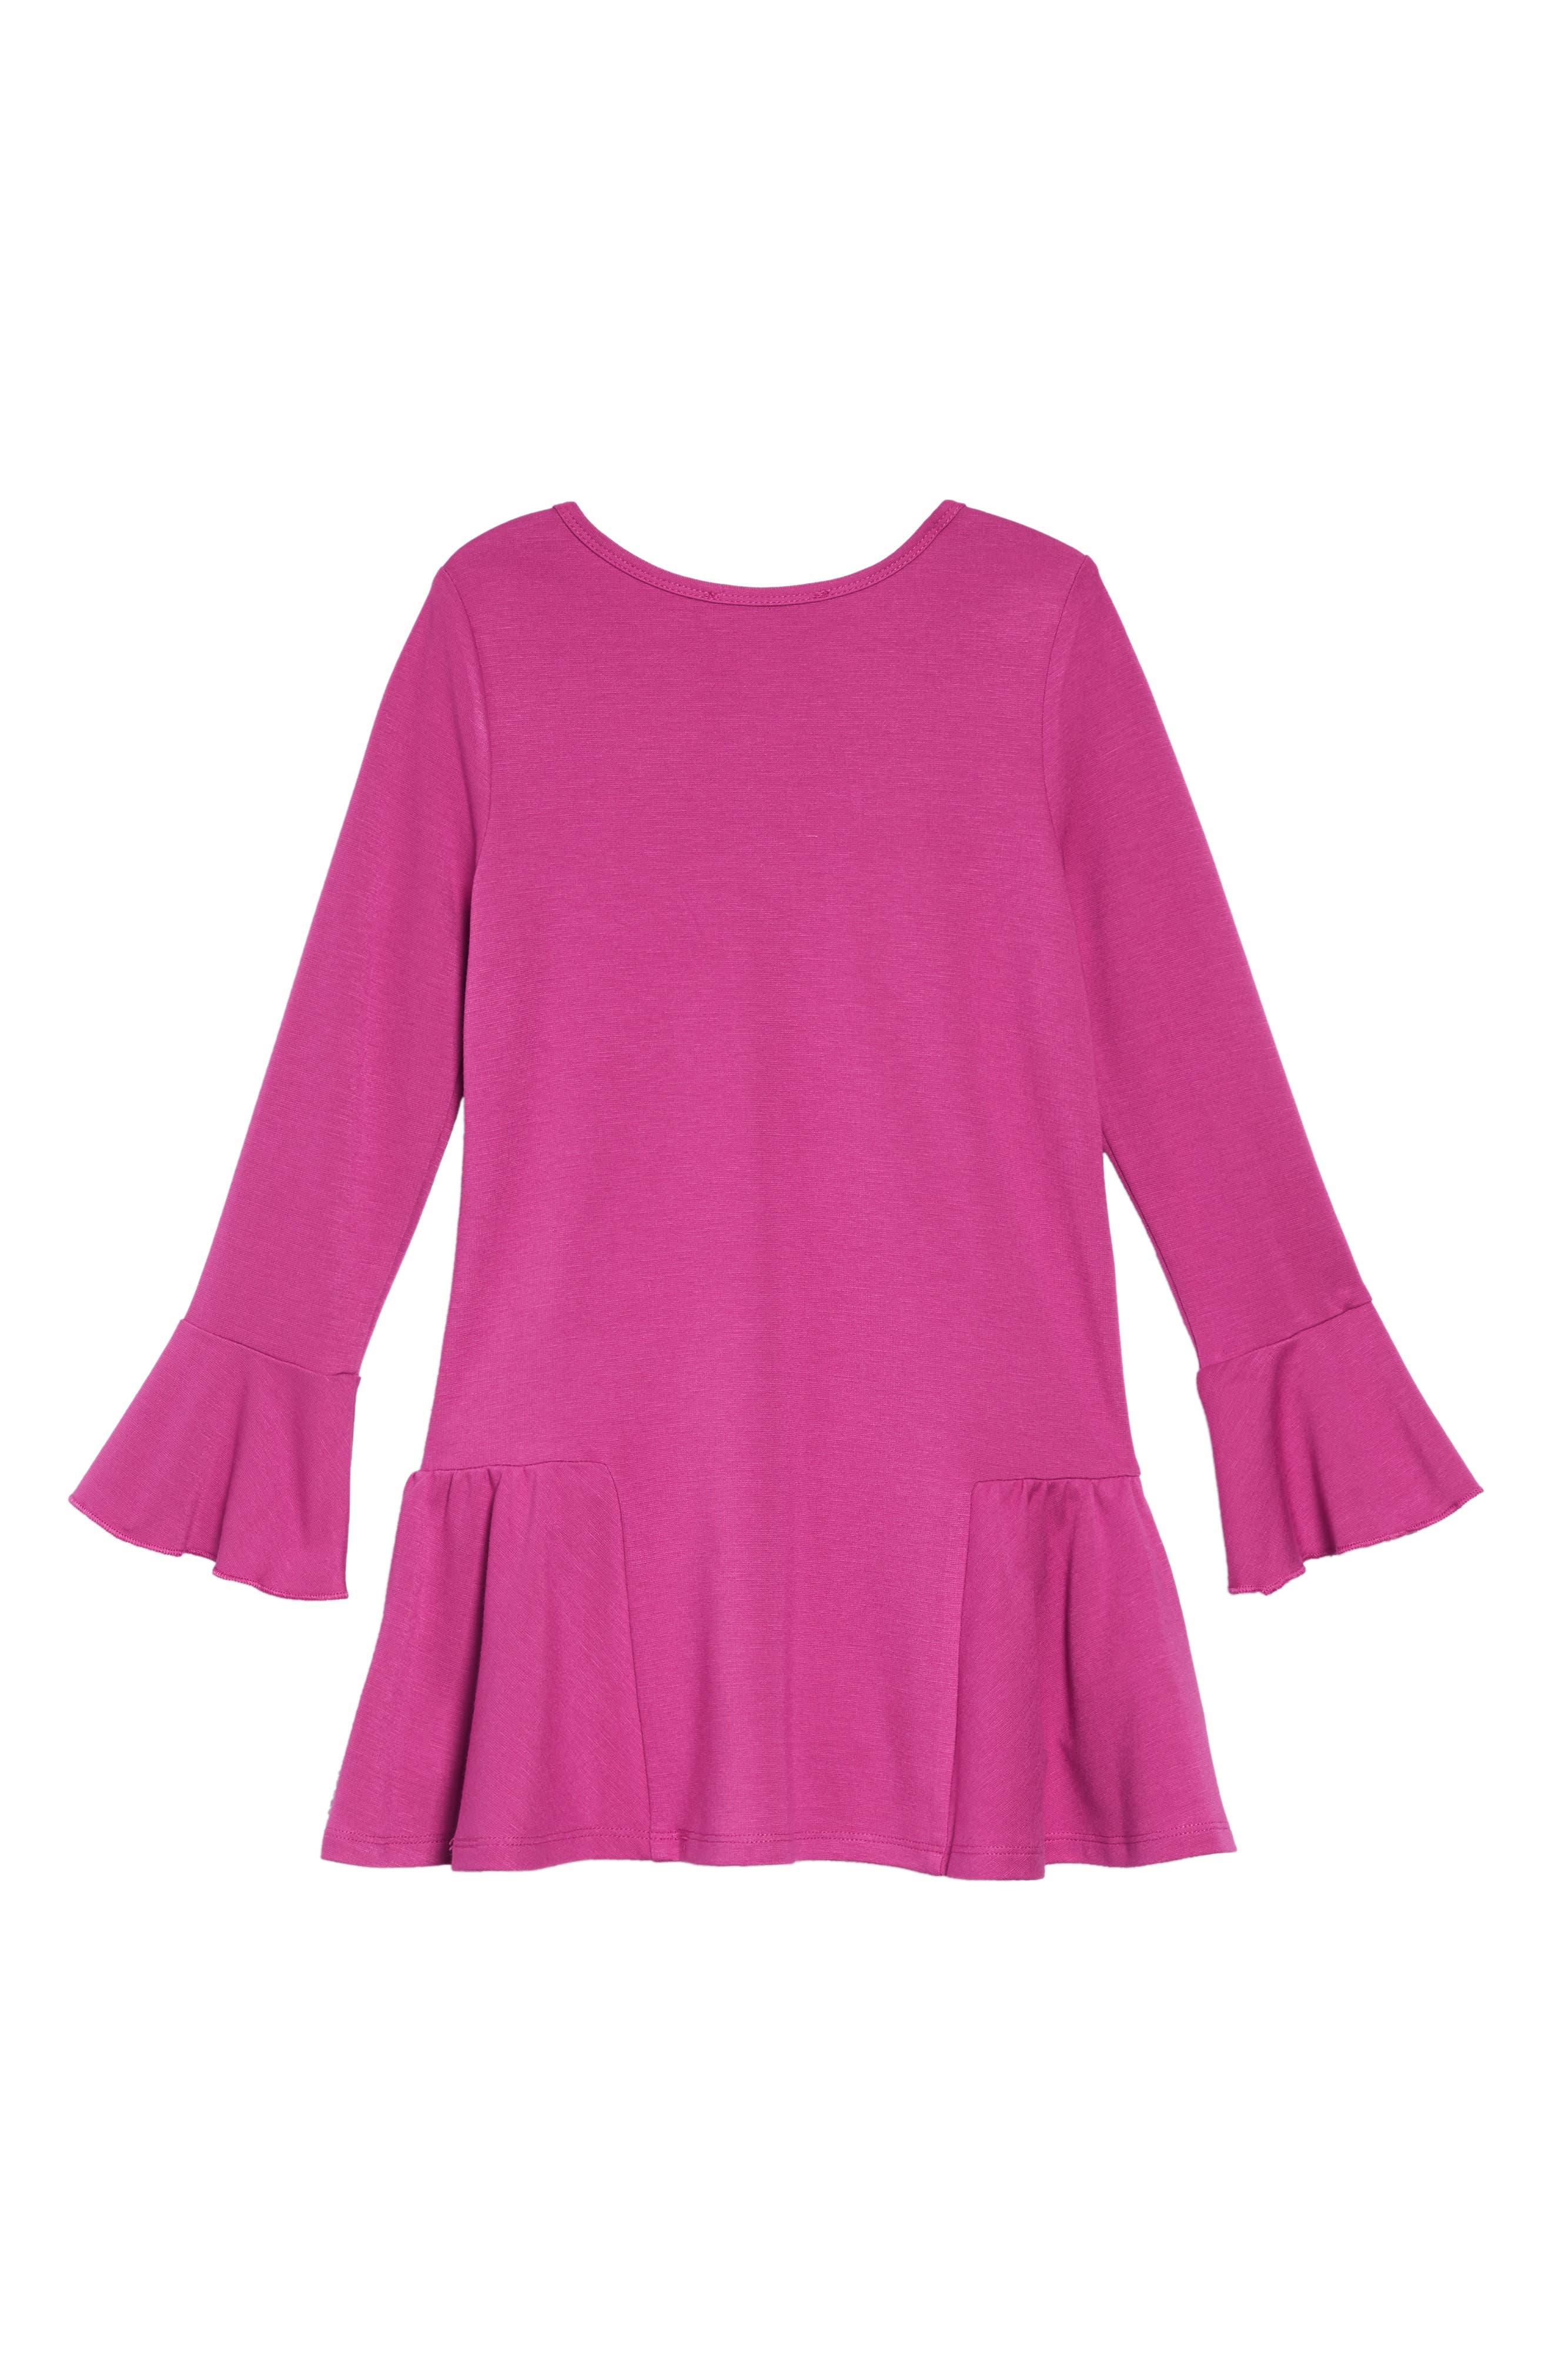 Knit Dress with Faux Fur Pouch,                             Alternate thumbnail 3, color,                             FUSCHIA